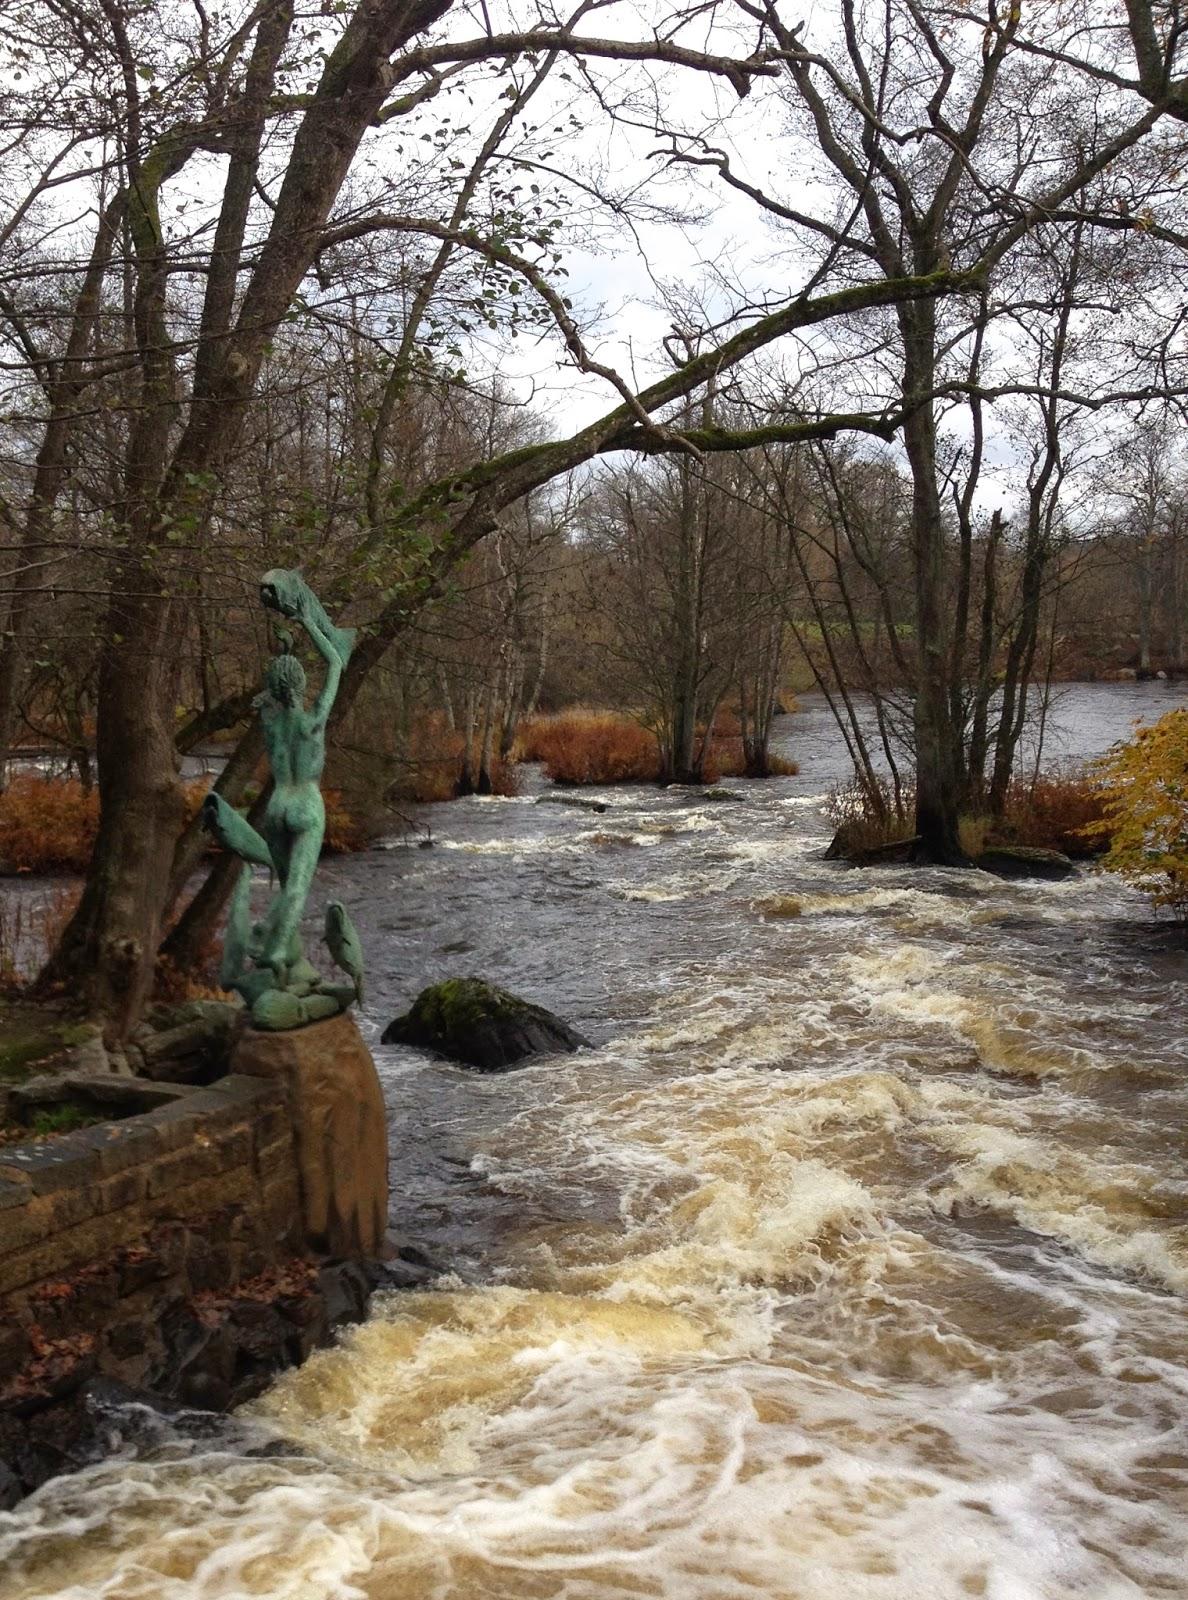 Fröken gröns blogg: november 2014